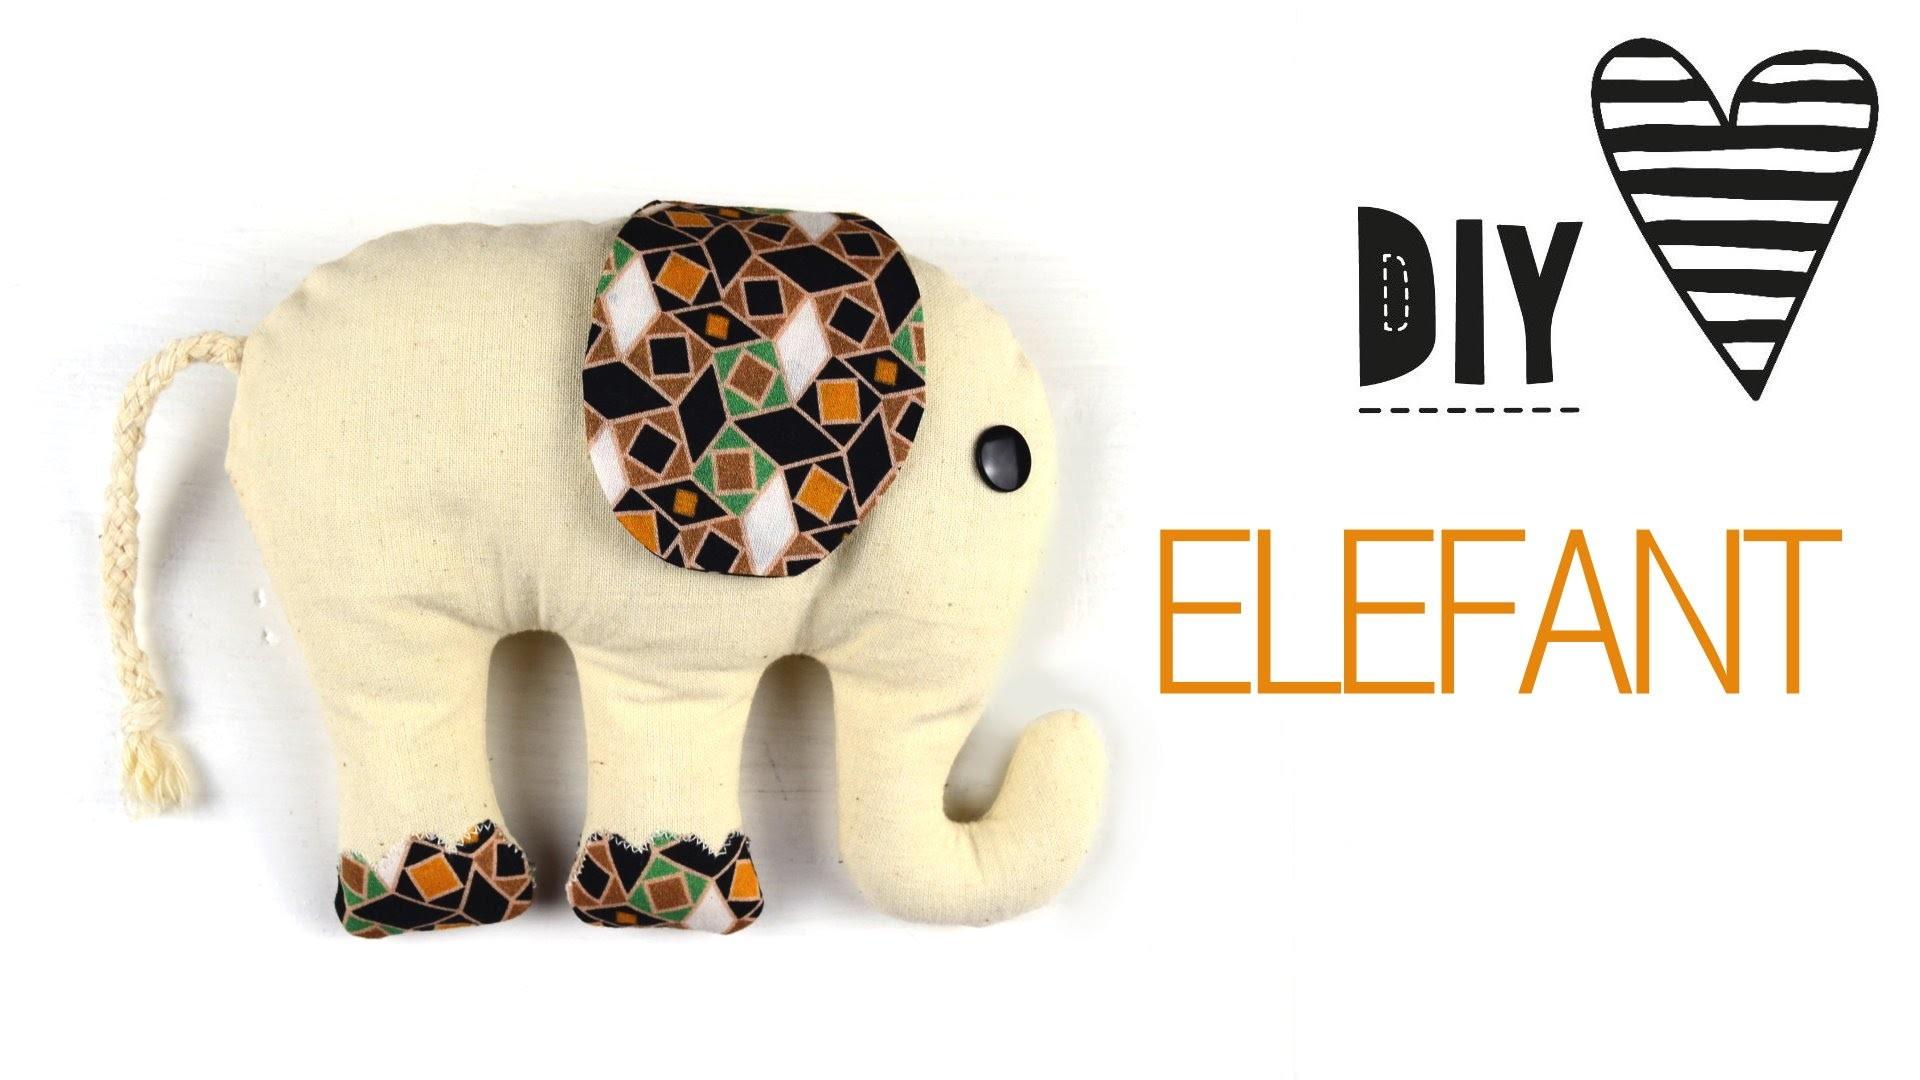 DIY Elefant Nähen. Kuscheltier mit Schnittmuster